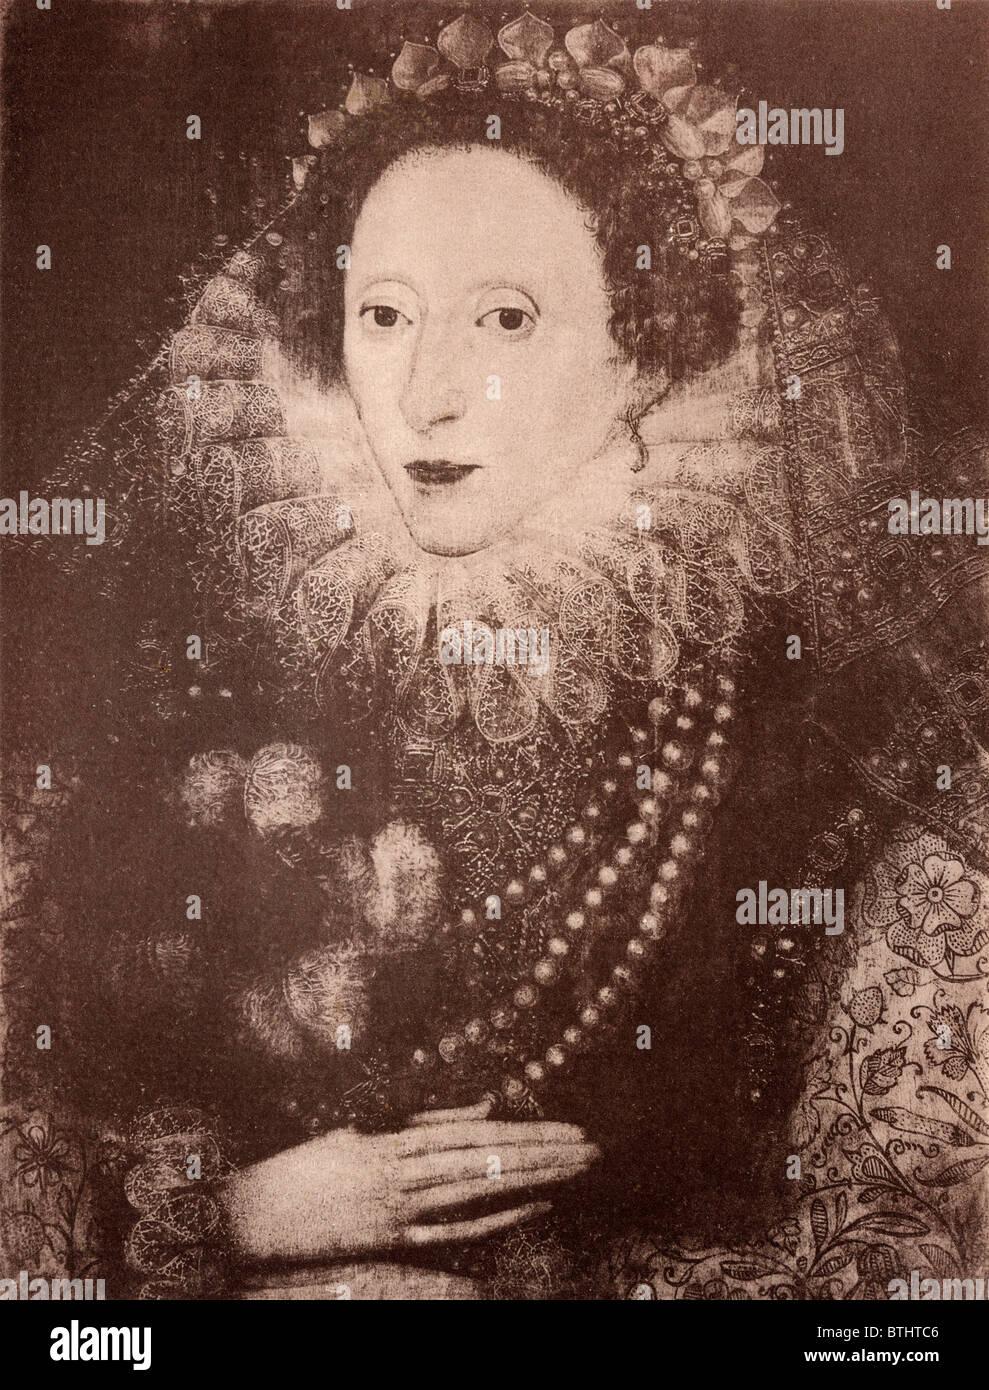 Queen Elizabeth I of England, 1533-1603. - Stock Image